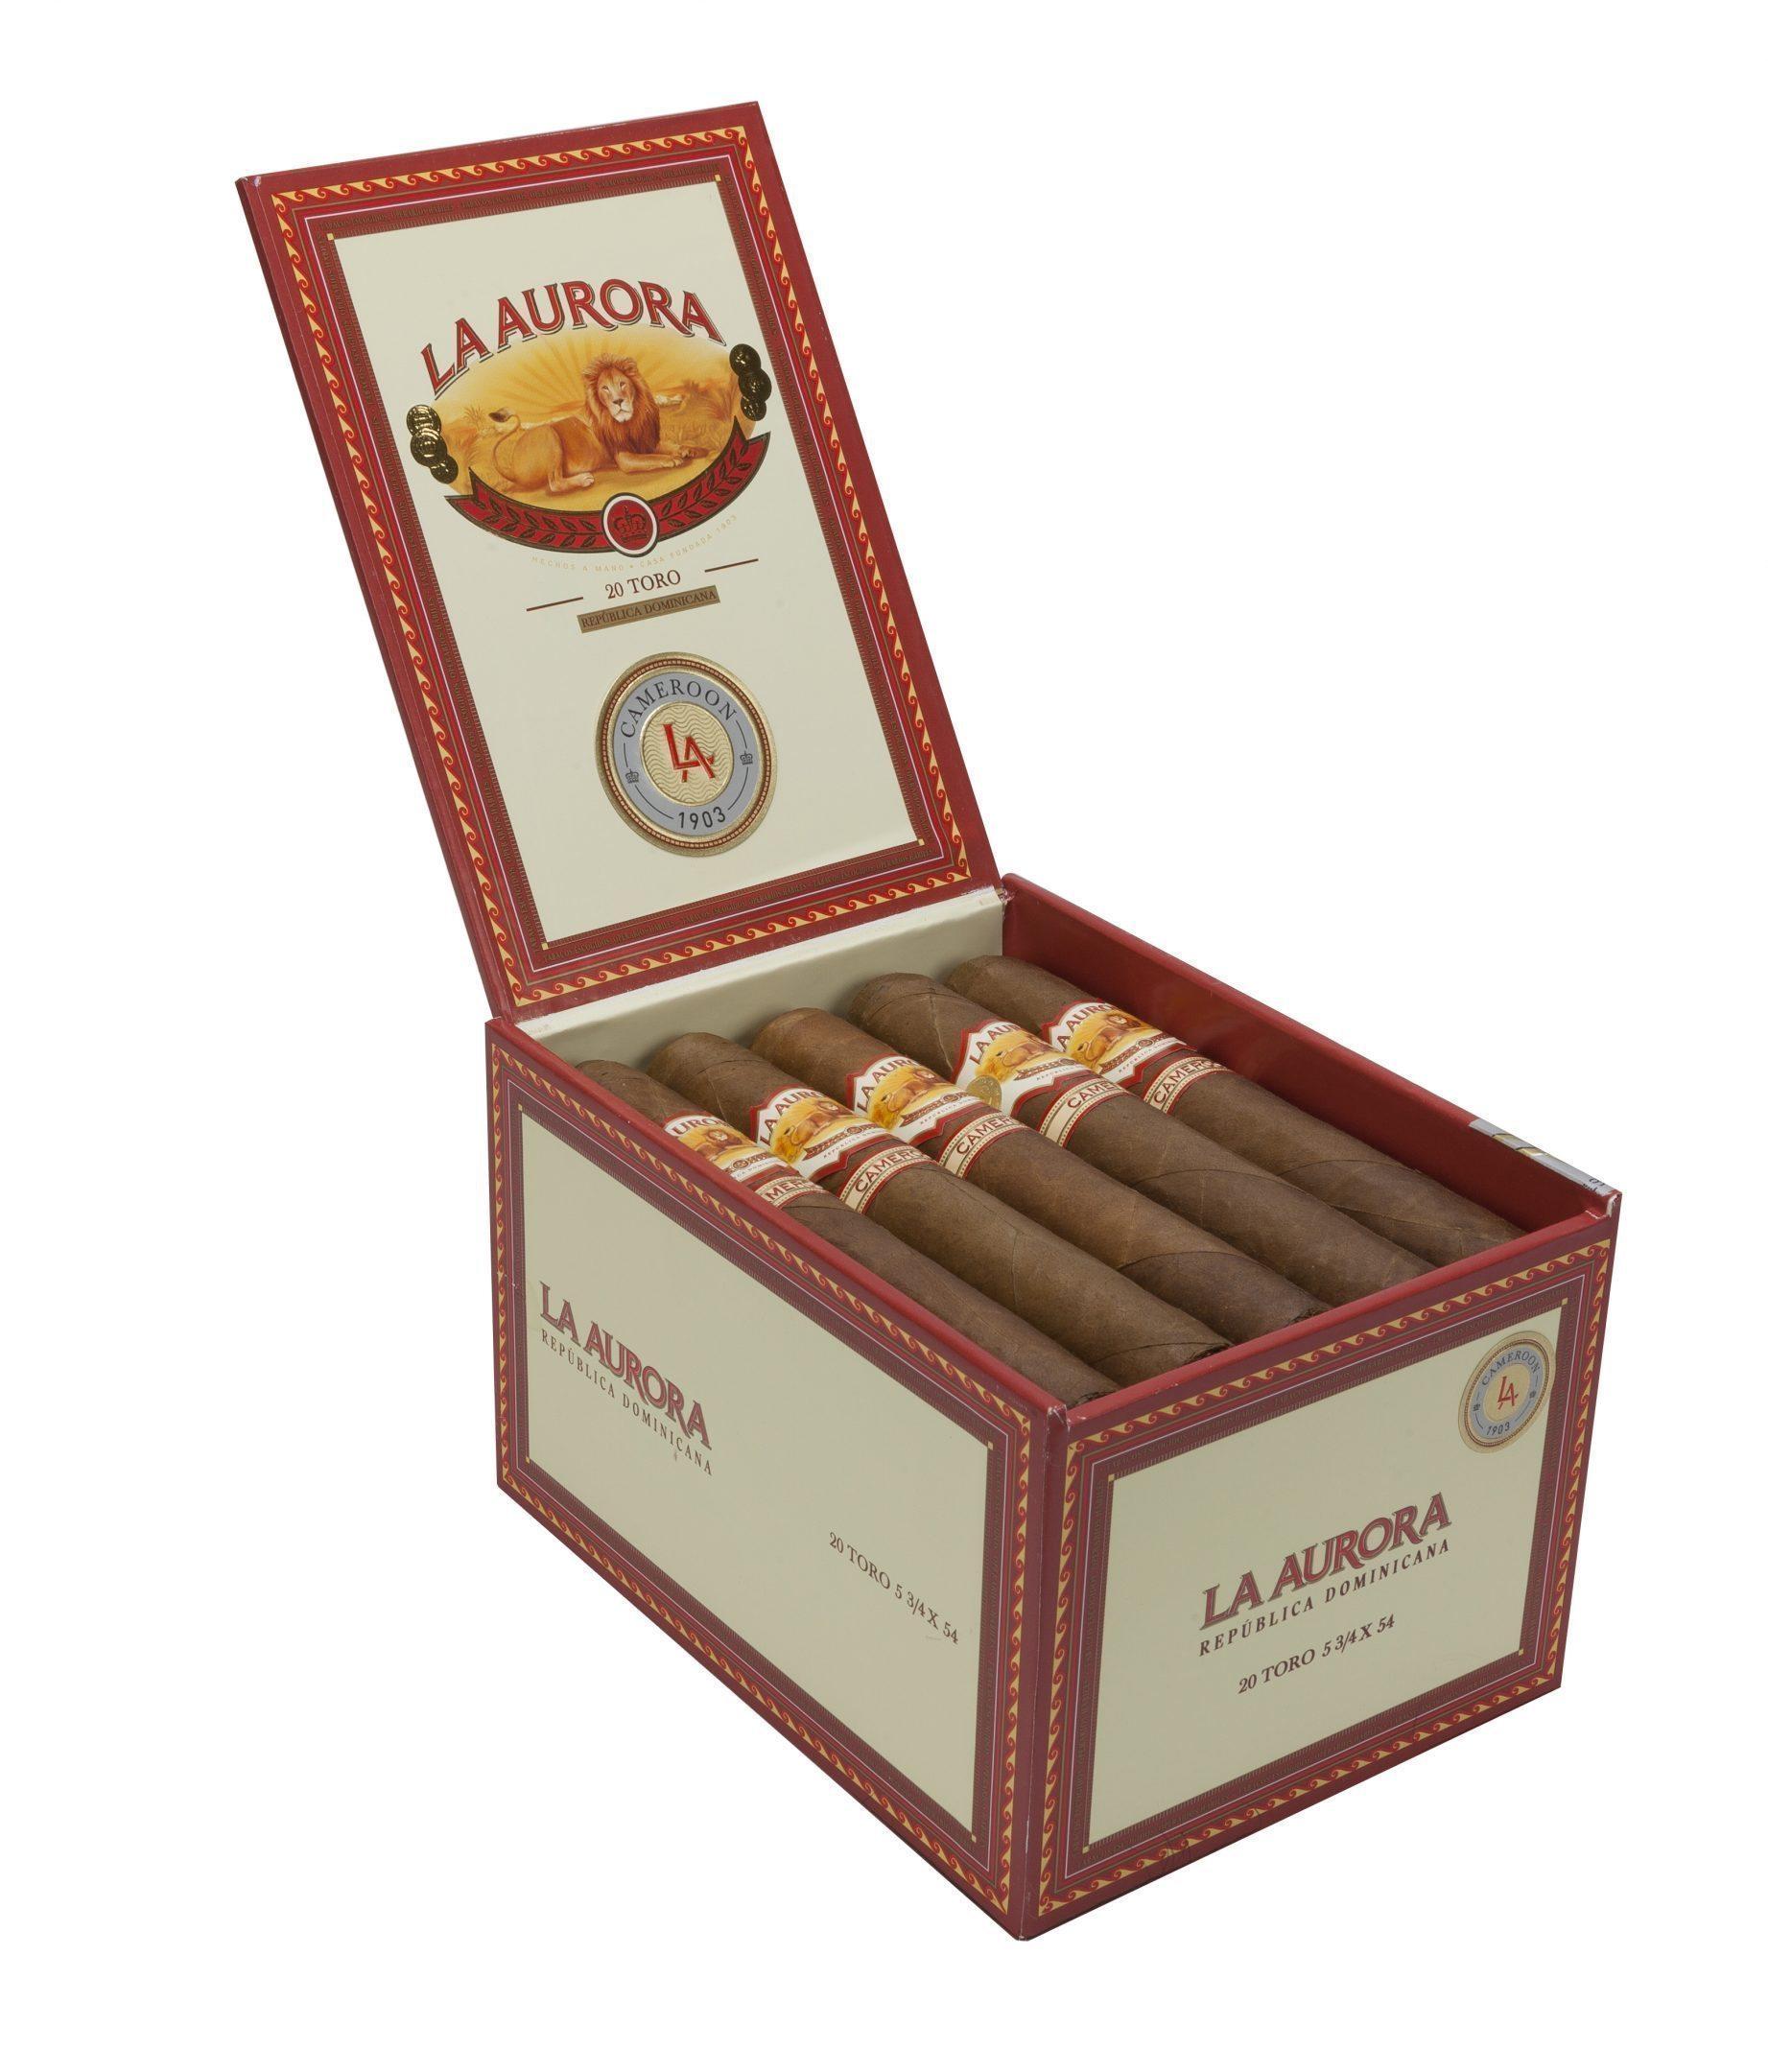 Cigar News: La Aurora Cameroon 1903 Shipping Now